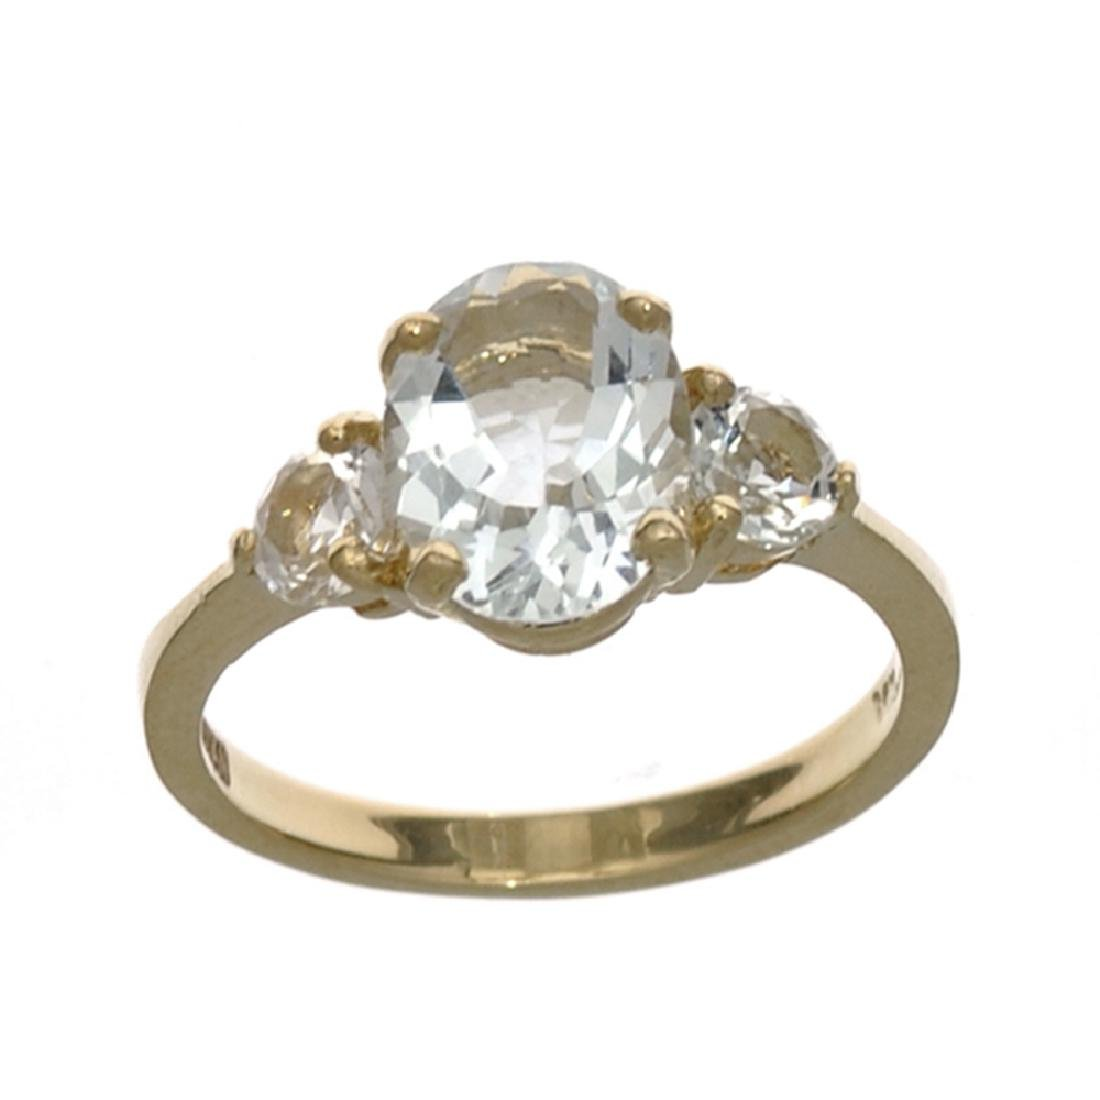 Fine Jewelry Designer Sebastian 14KT Gold, 2.30CT